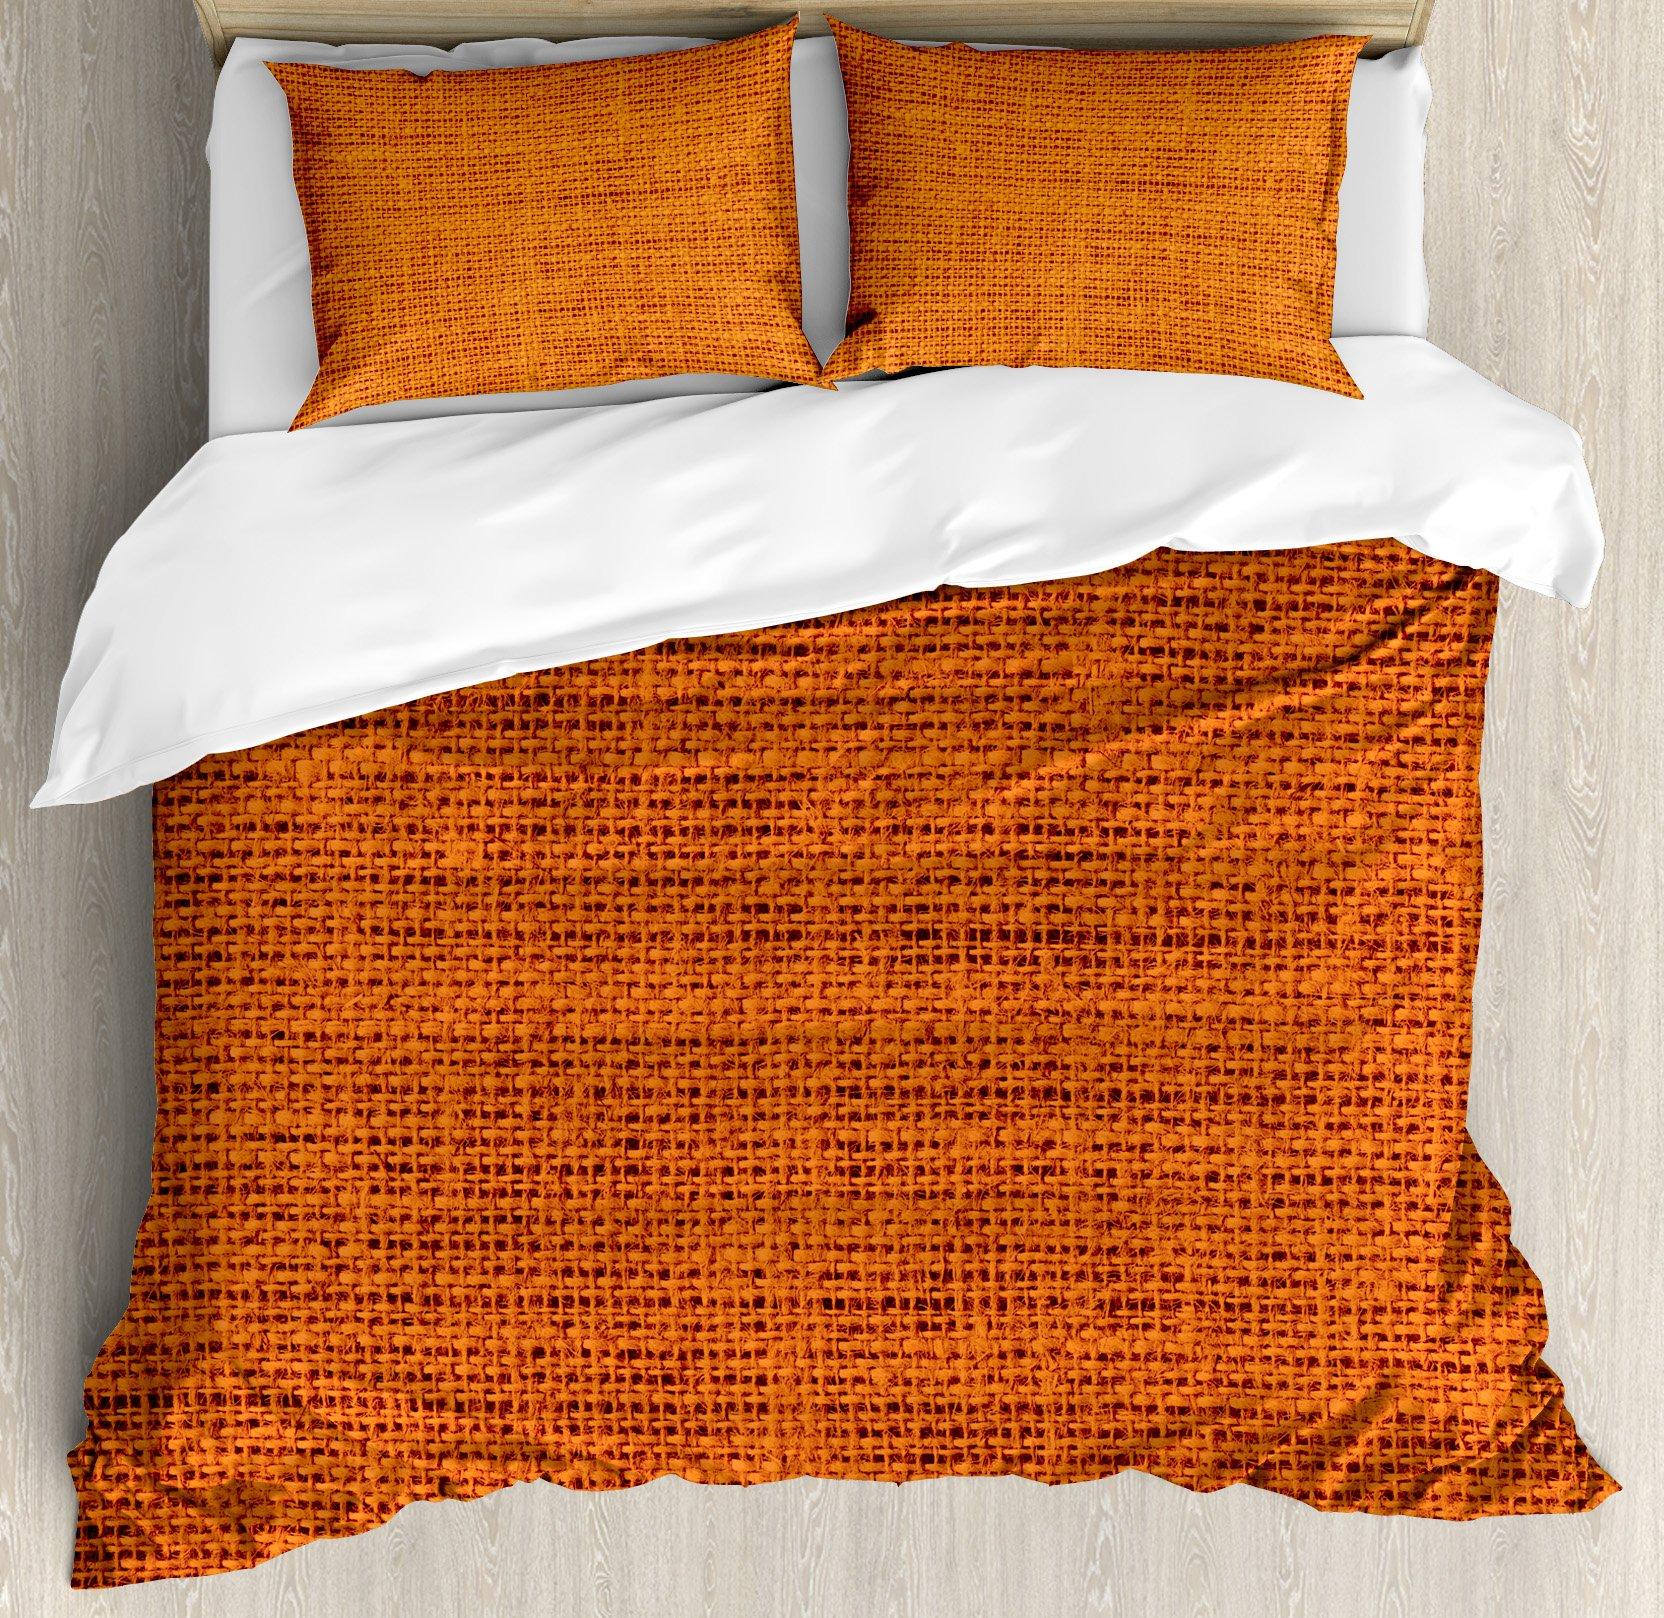 Burnt Orange Duvet Cover Set King Size by Ambesonne, Faded Burlap Texture Background of Macro Thick Fabric Graphic Mat Decor Artrpint, Decorative 3 Piece Bedding Set with 2 Pillow Shams, Burnt Orange